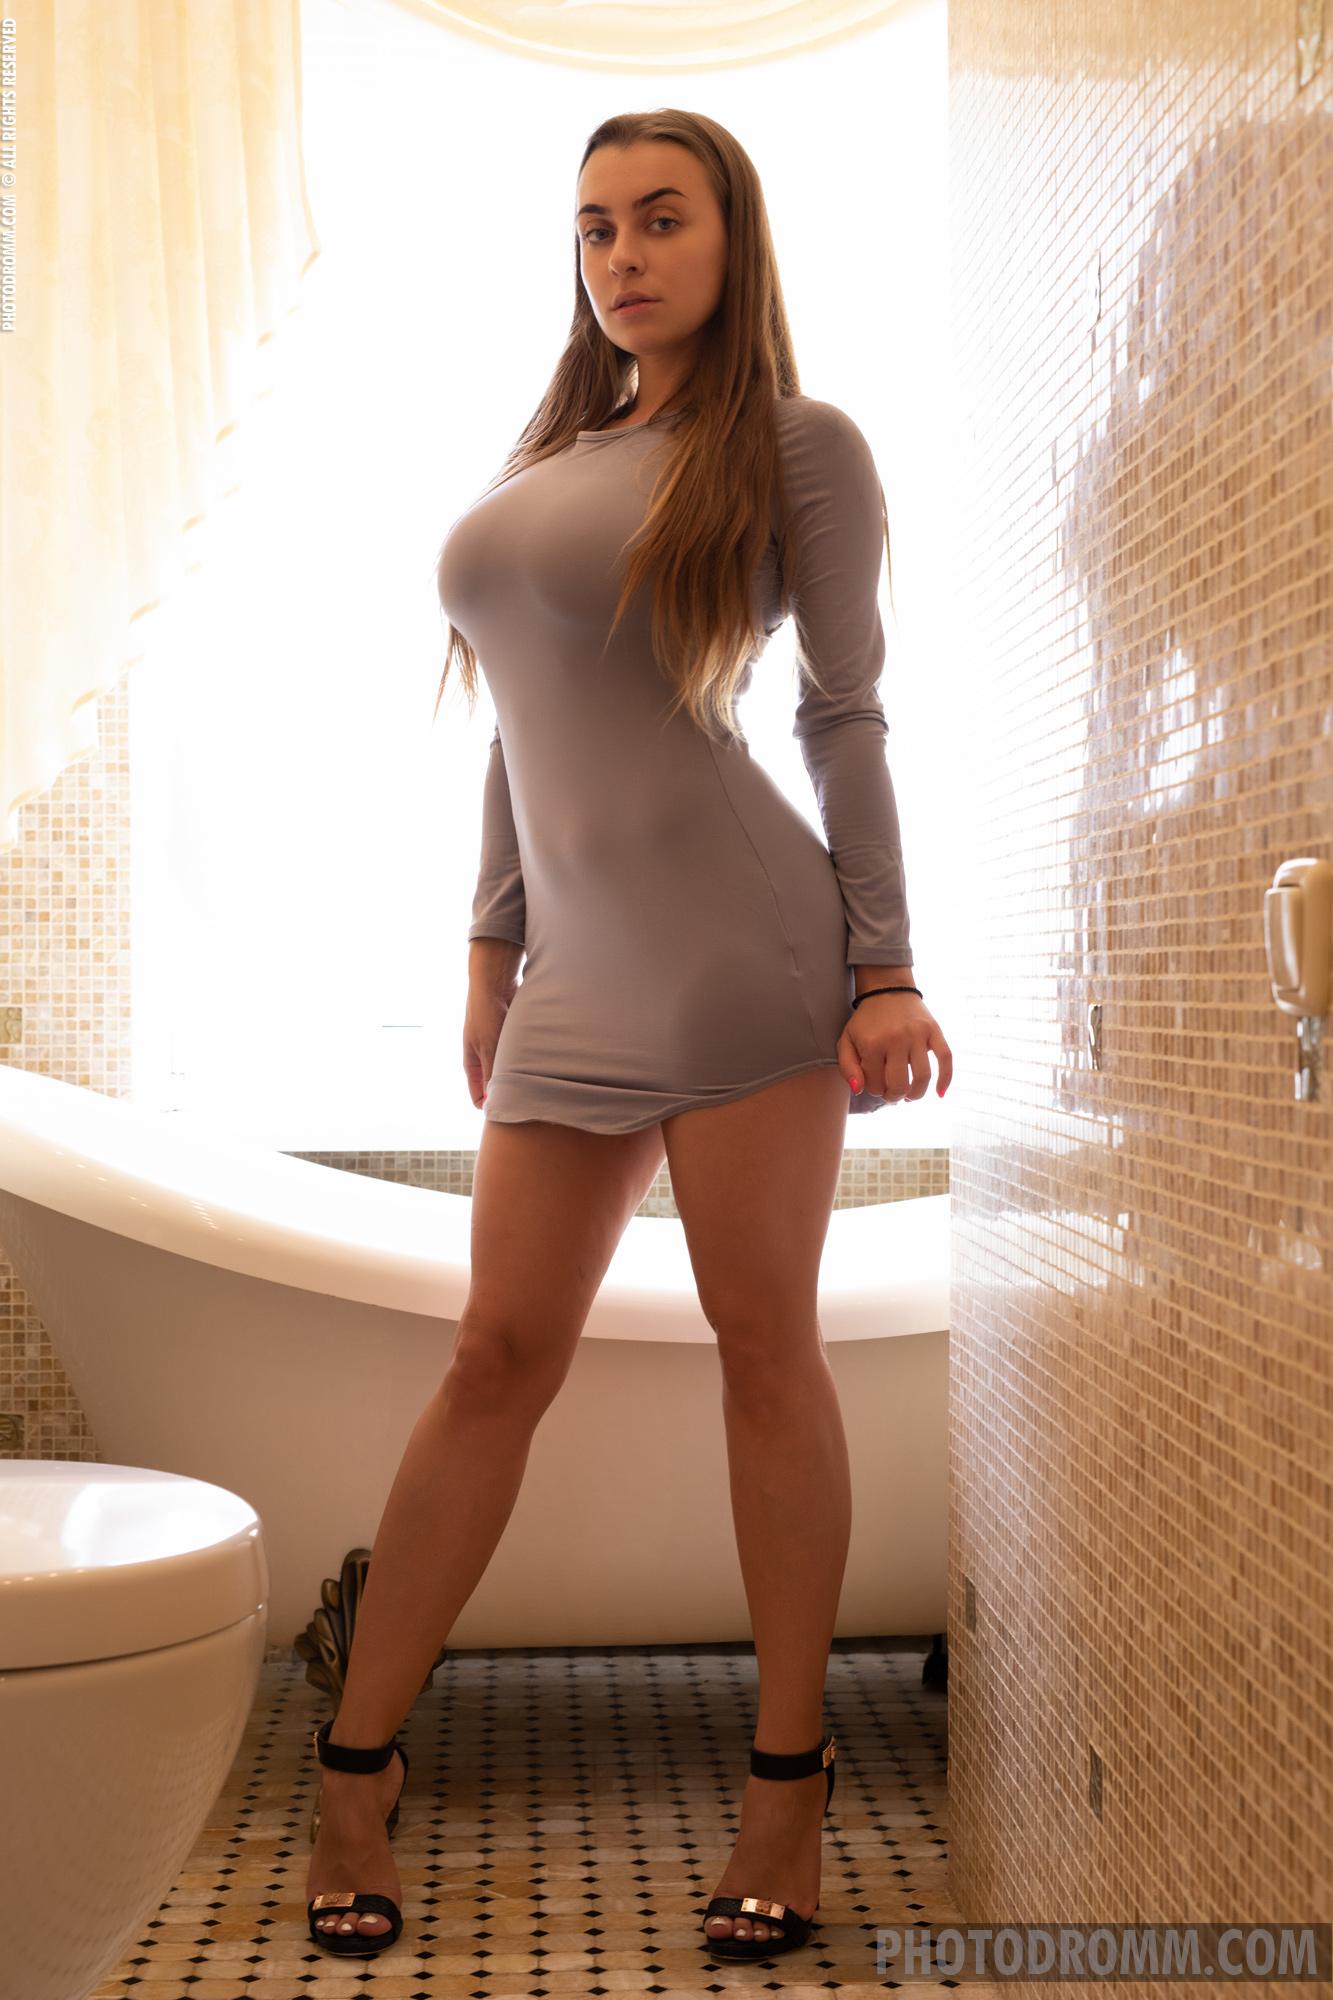 Josephine Big TIts in Tight Minidress has Bathtime for Photodromm